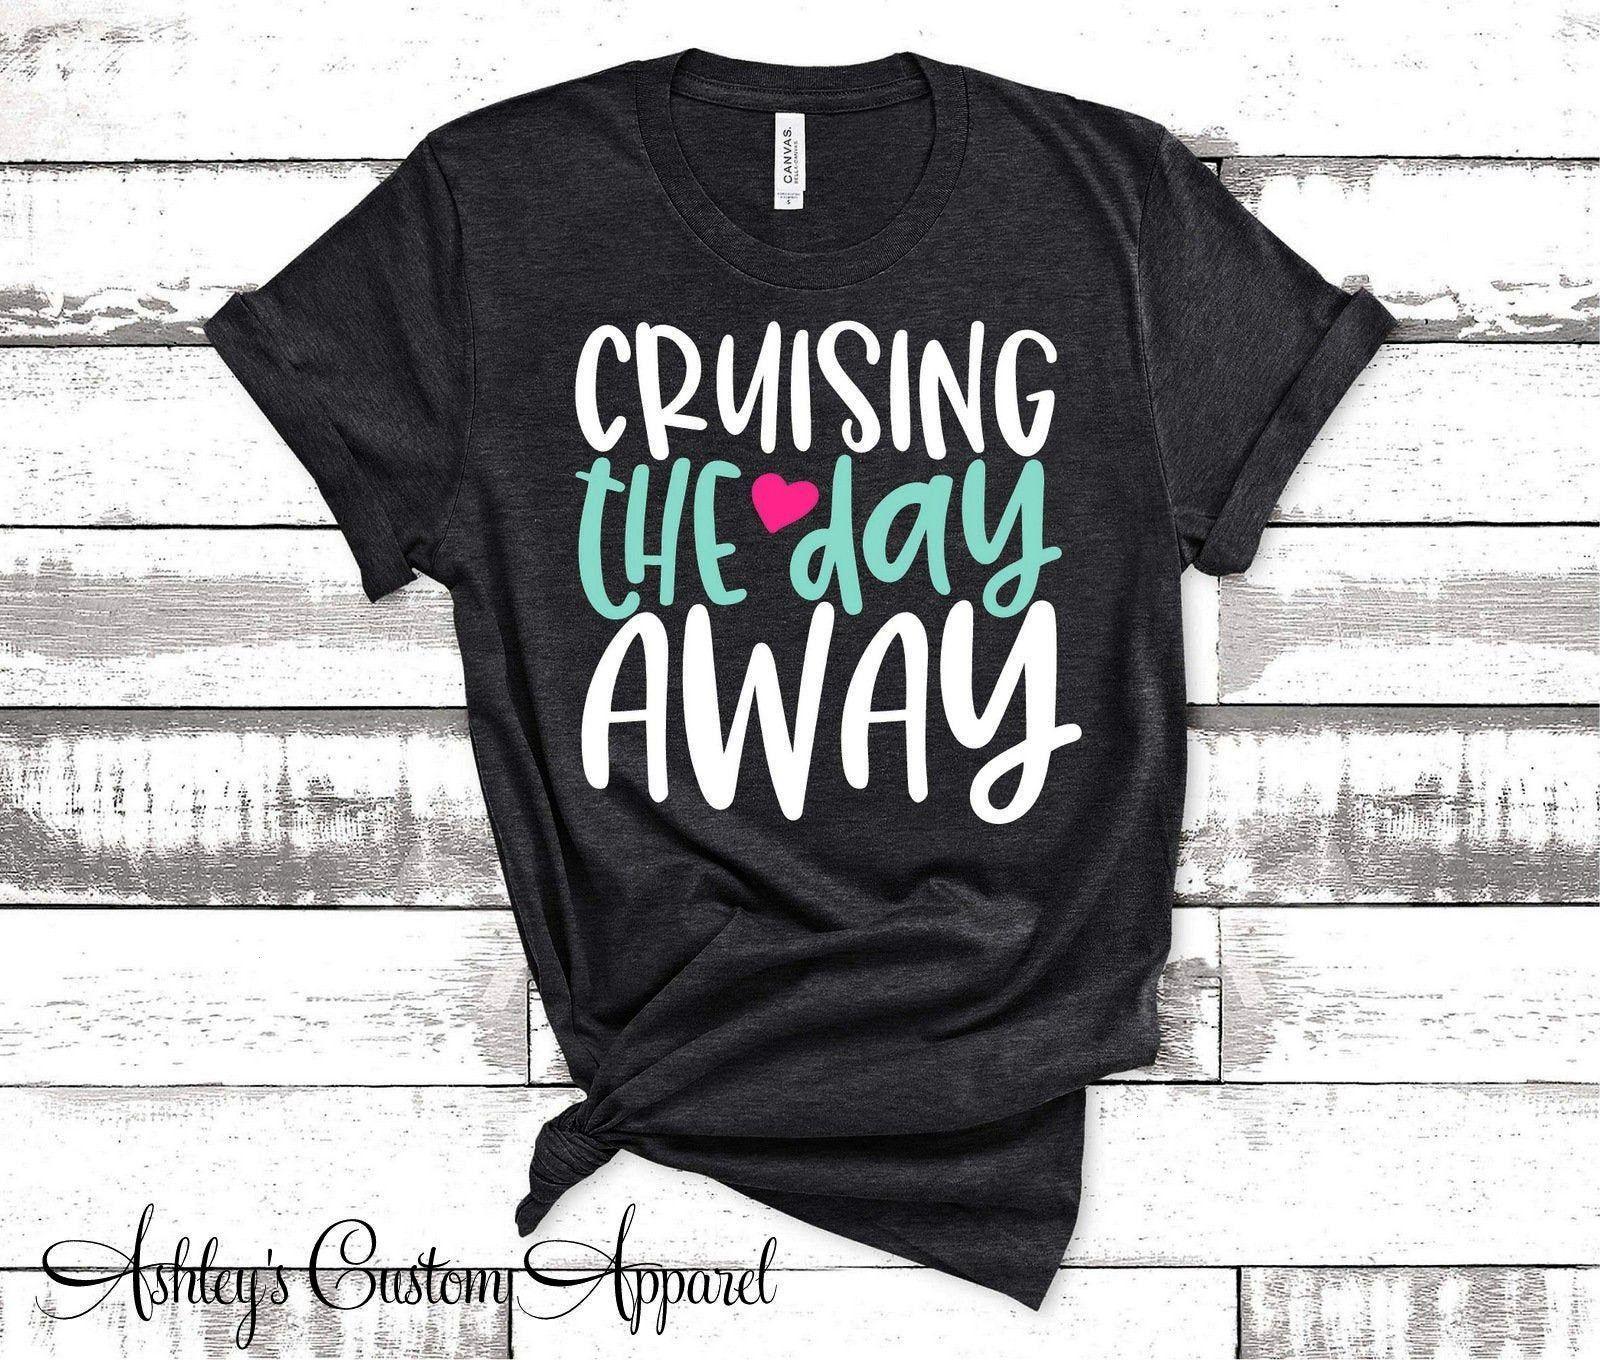 Shirts Cruising The Day Away Family Cruise Tshirt Matching Group Cruise Vacation Shirt Cruise Ship Tee Swimsuit Coverup Womens Cruise Source by Ashleyscustomap Look tshir...